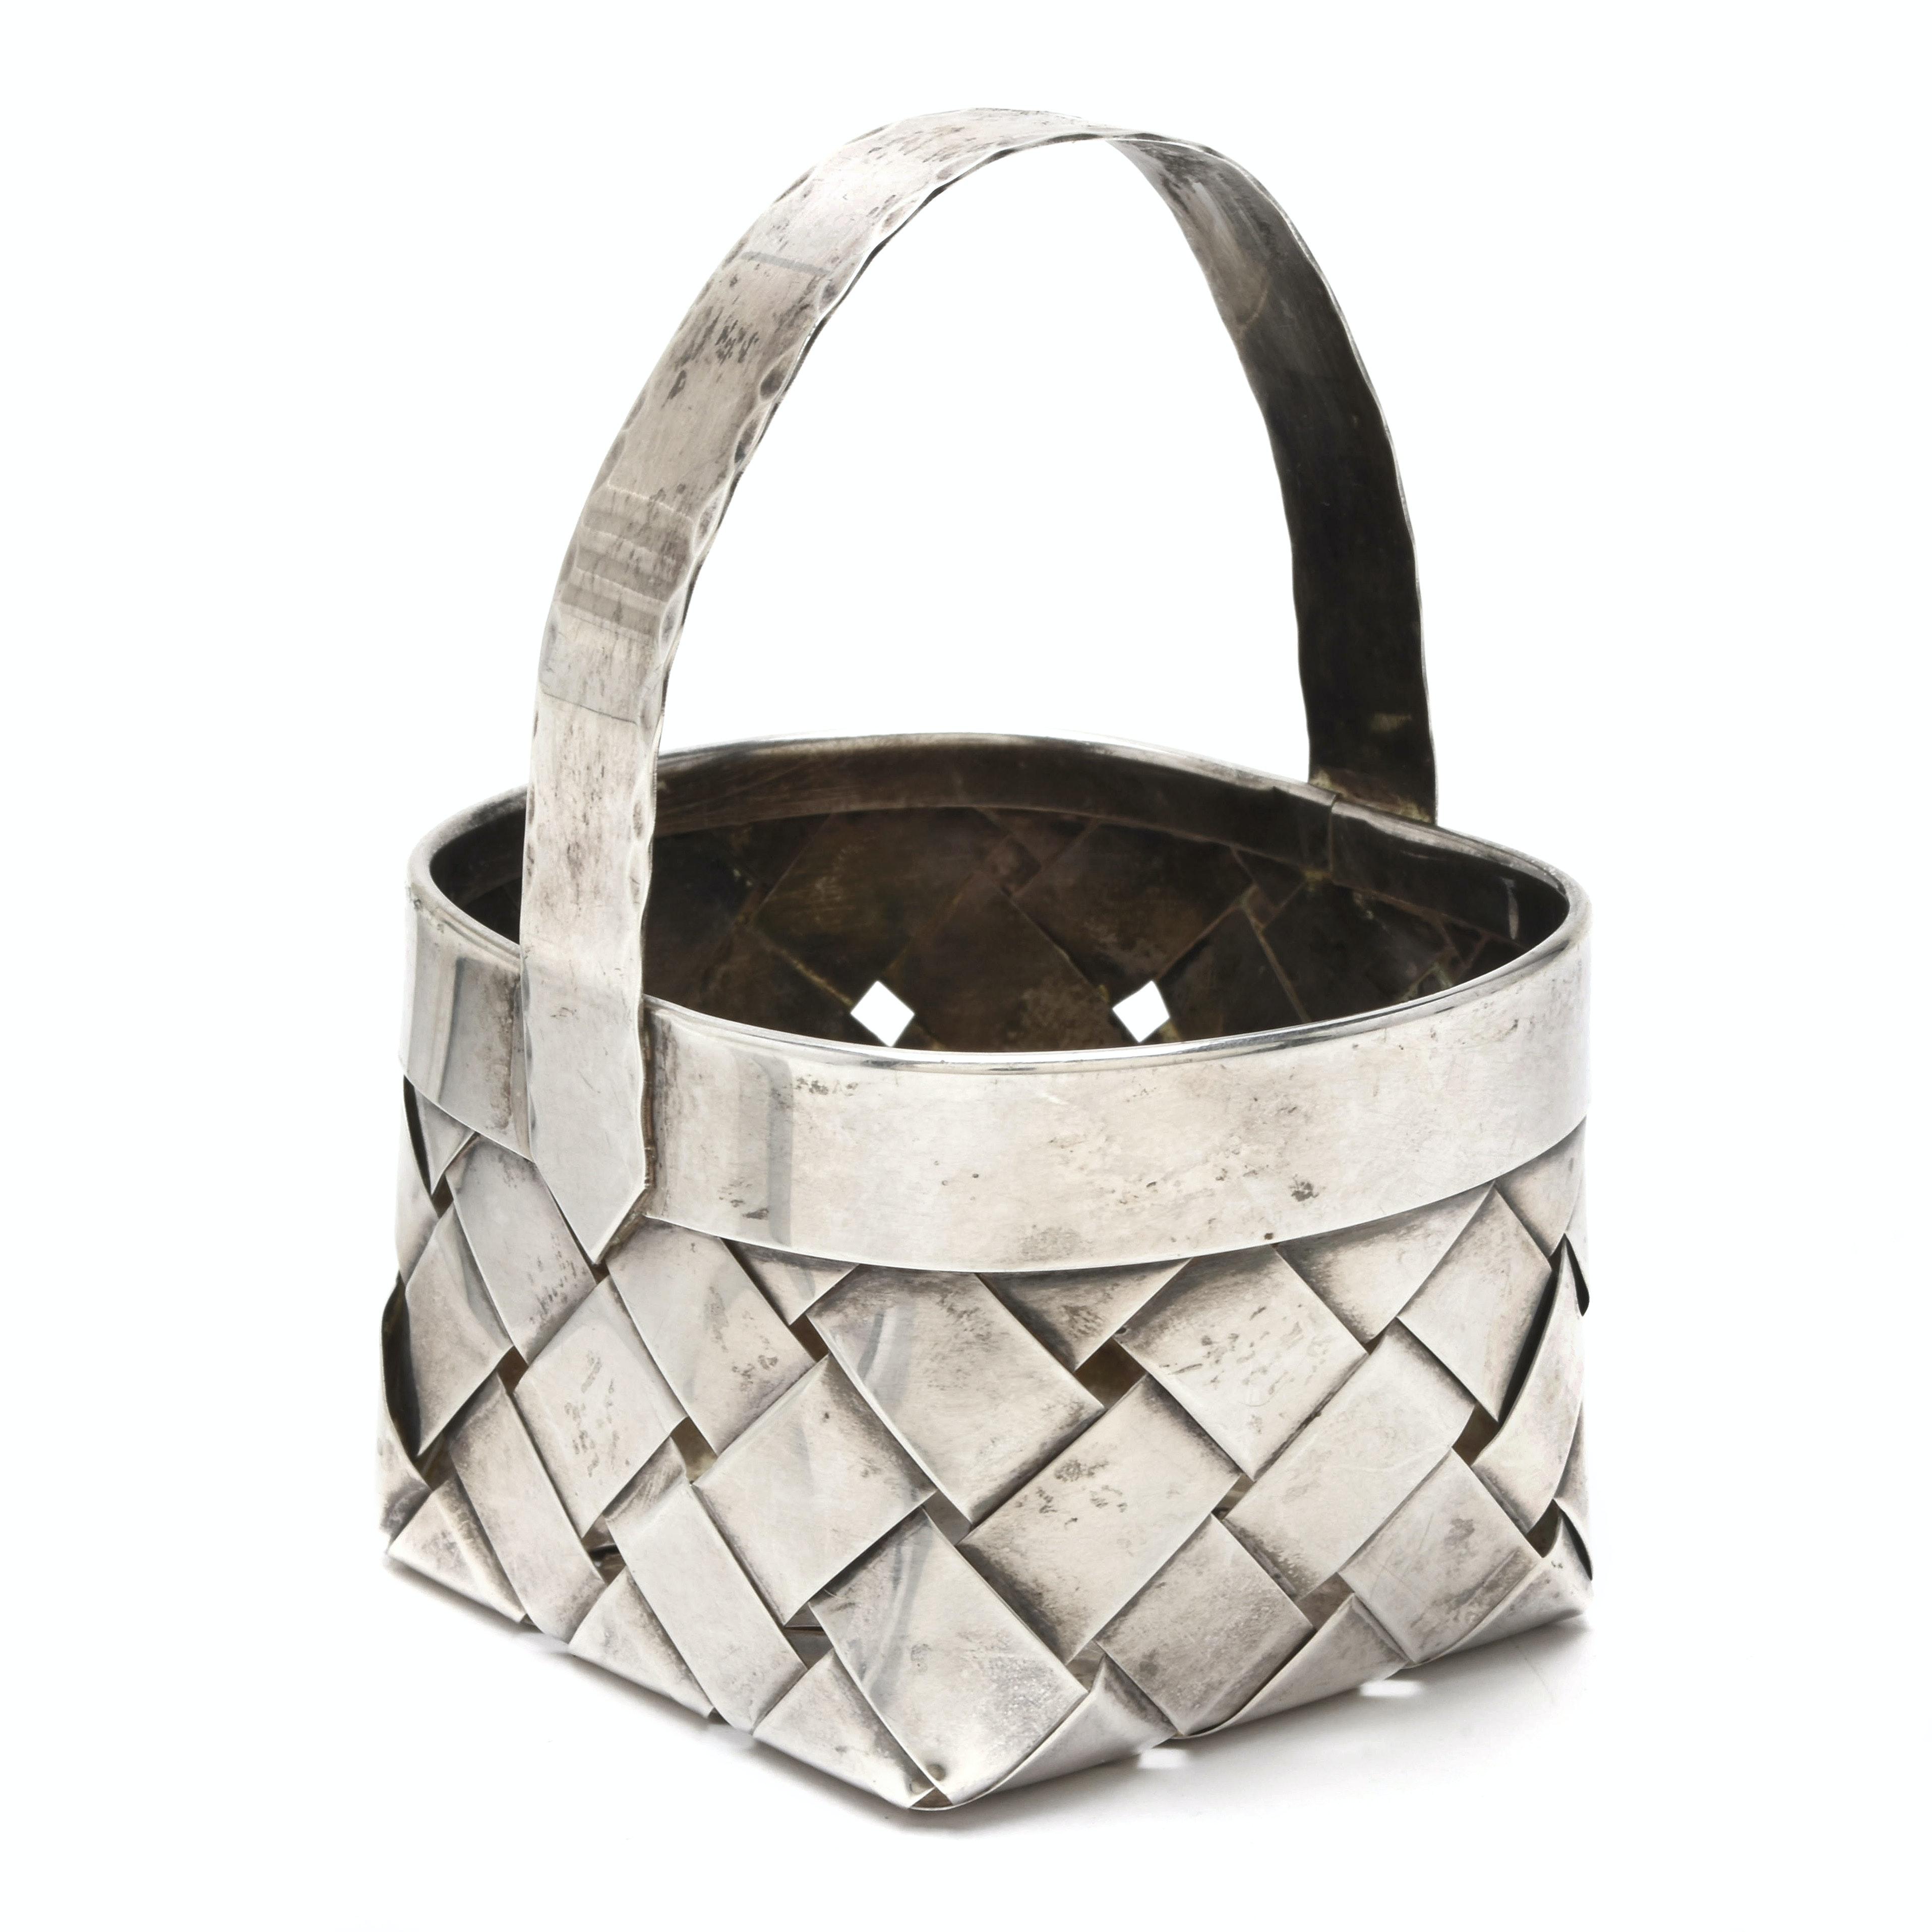 Cartier Miniature Sterling Silver Basket